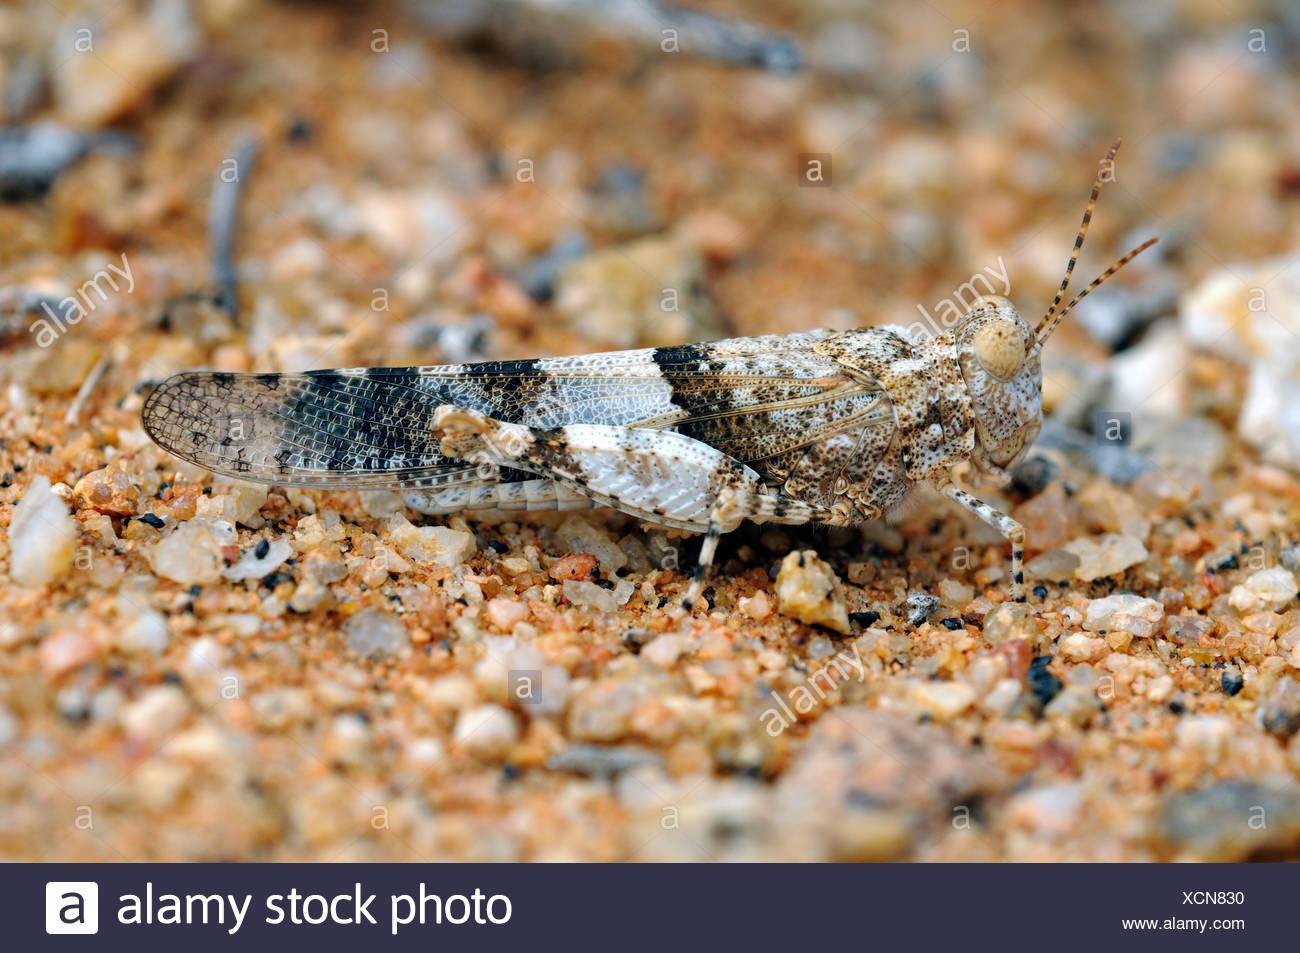 Feld-Grashüpfer (Acrotylus) in perfekte Tarnung der Farbe des umgebenden felsigen Gelände, Nature Reserve, Namaqualand Stockbild